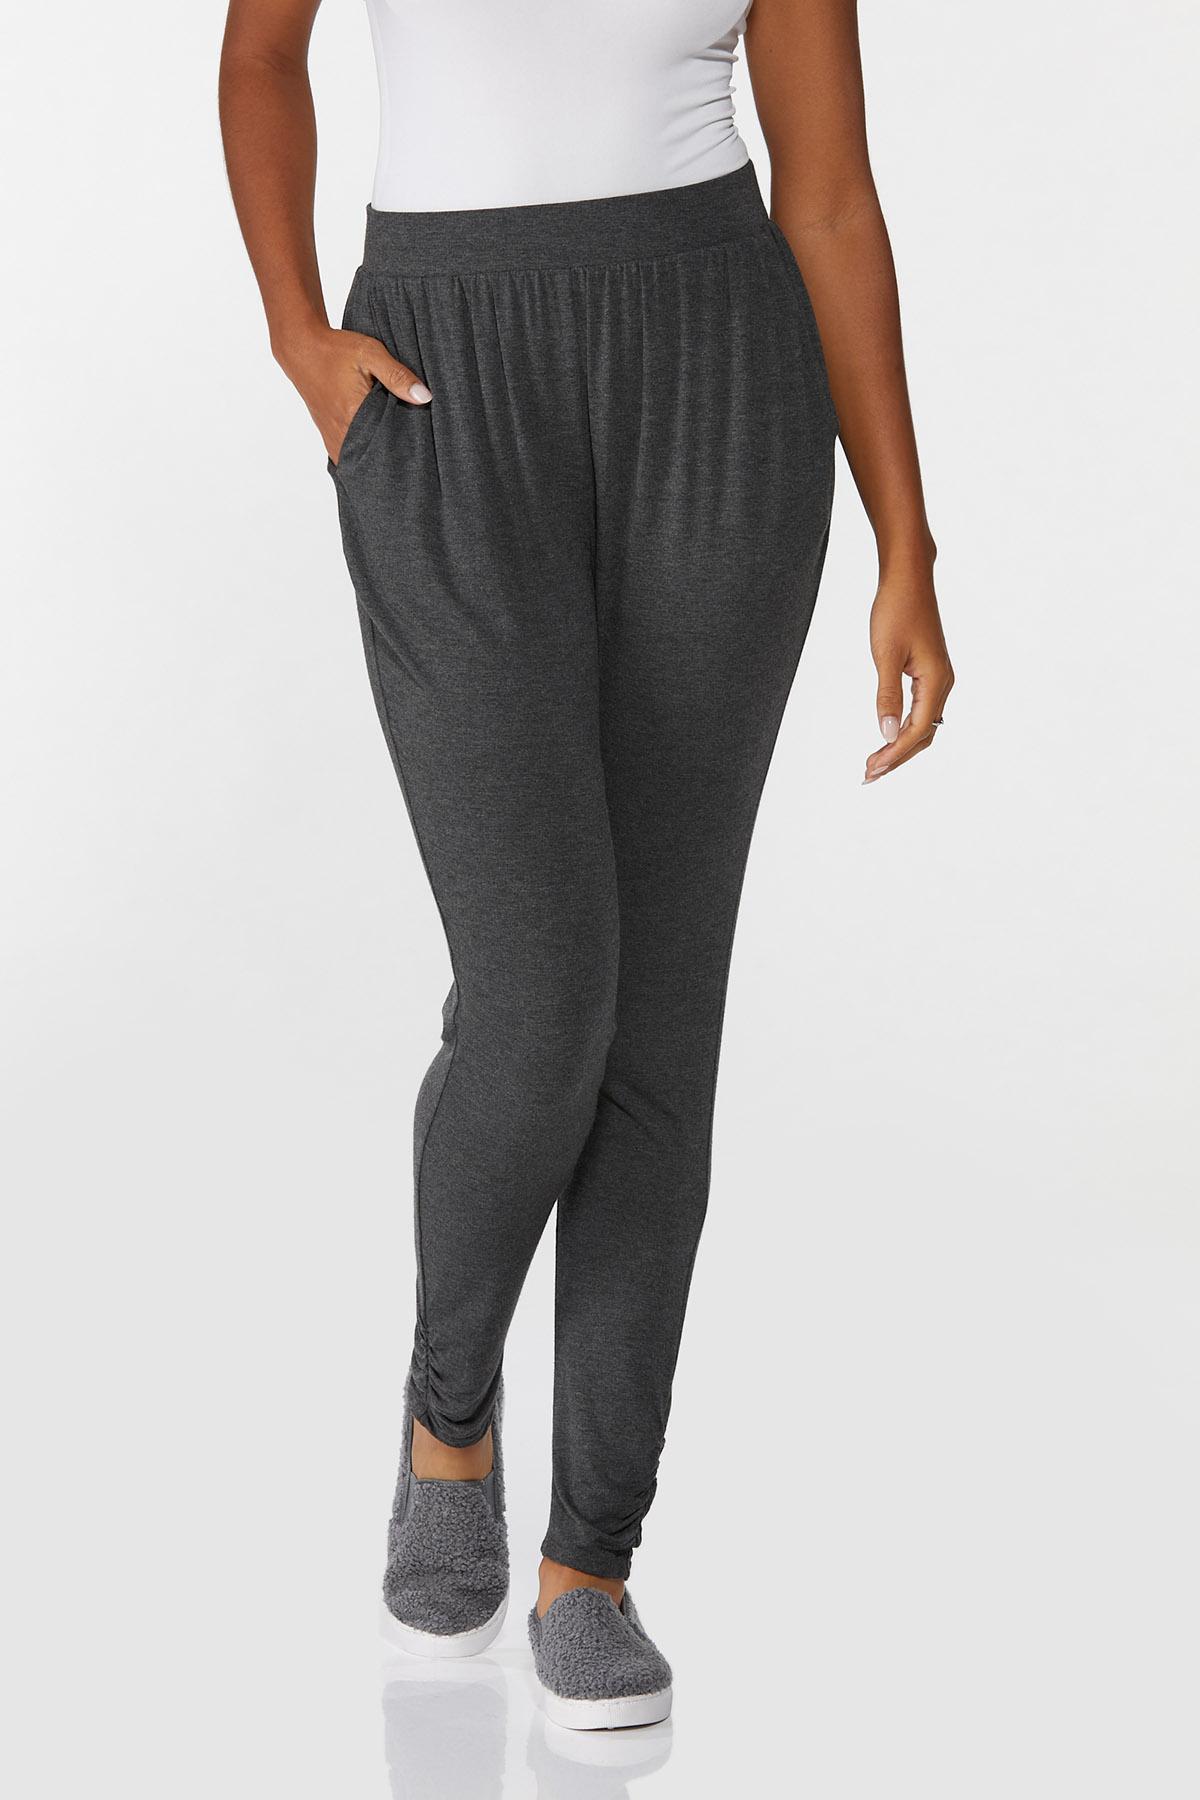 Charcoal Pull-On Pants